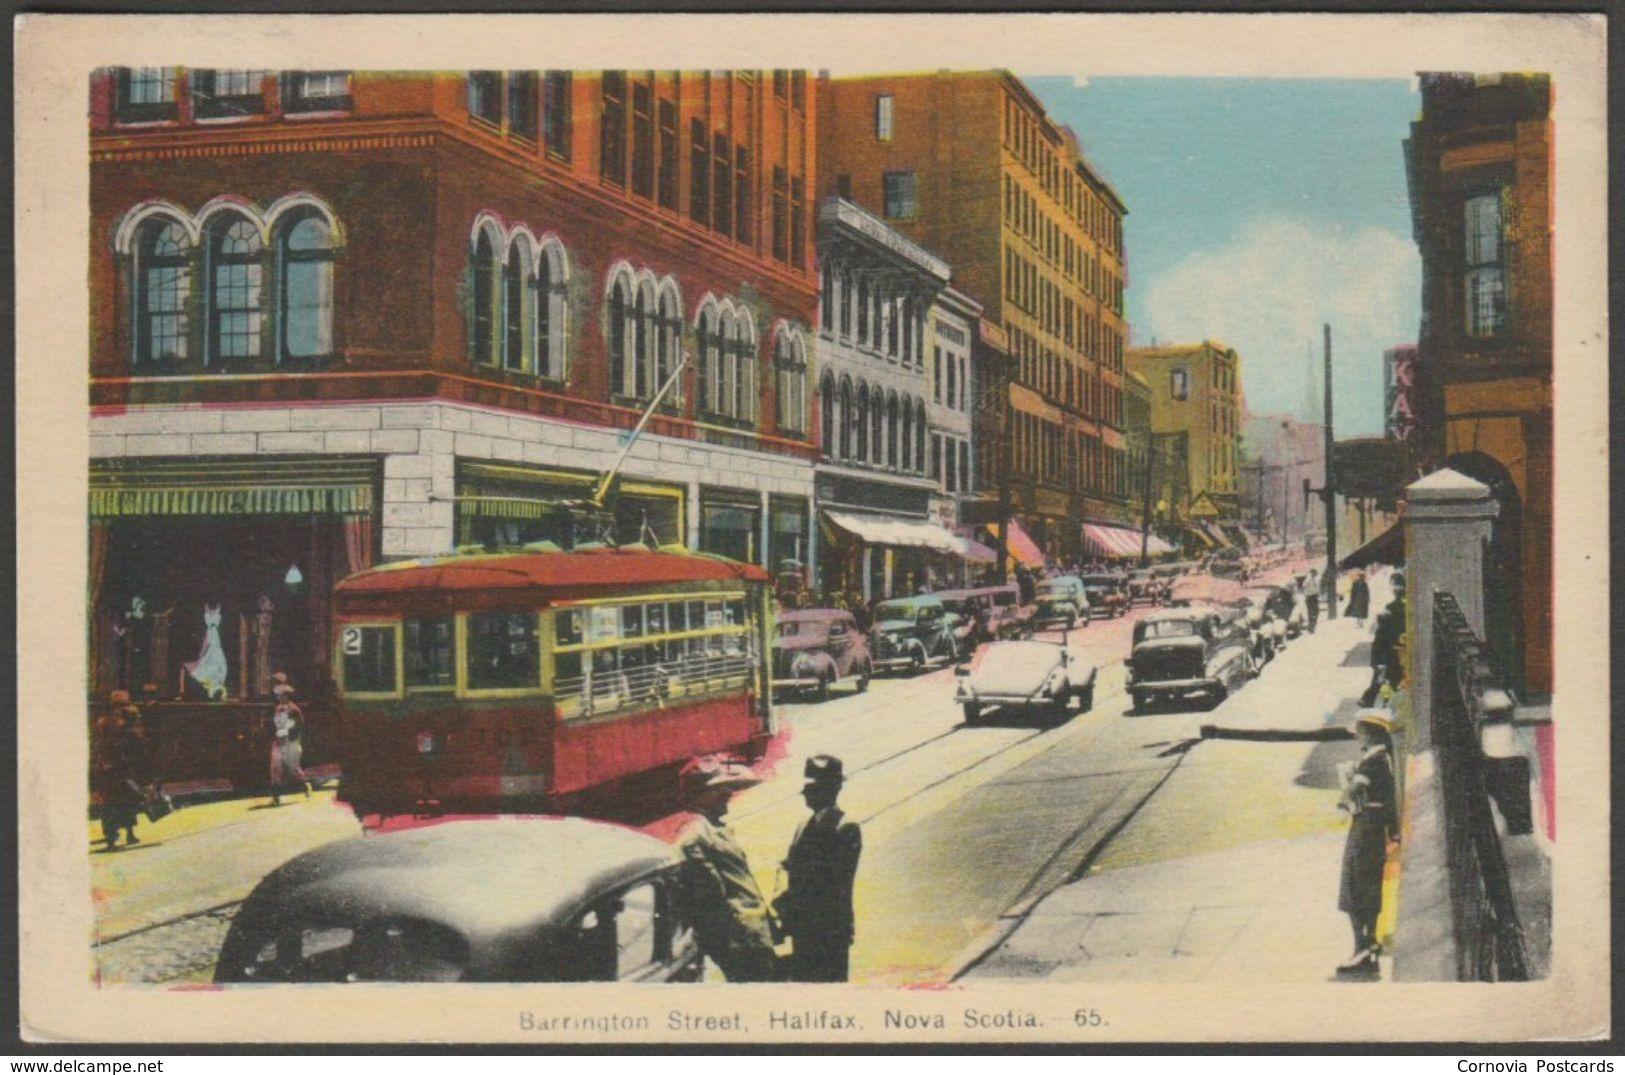 Barrington Street, Halifax, Nova Scotia, C.1930s - Photogelatine Engraving Co Postcard - Halifax